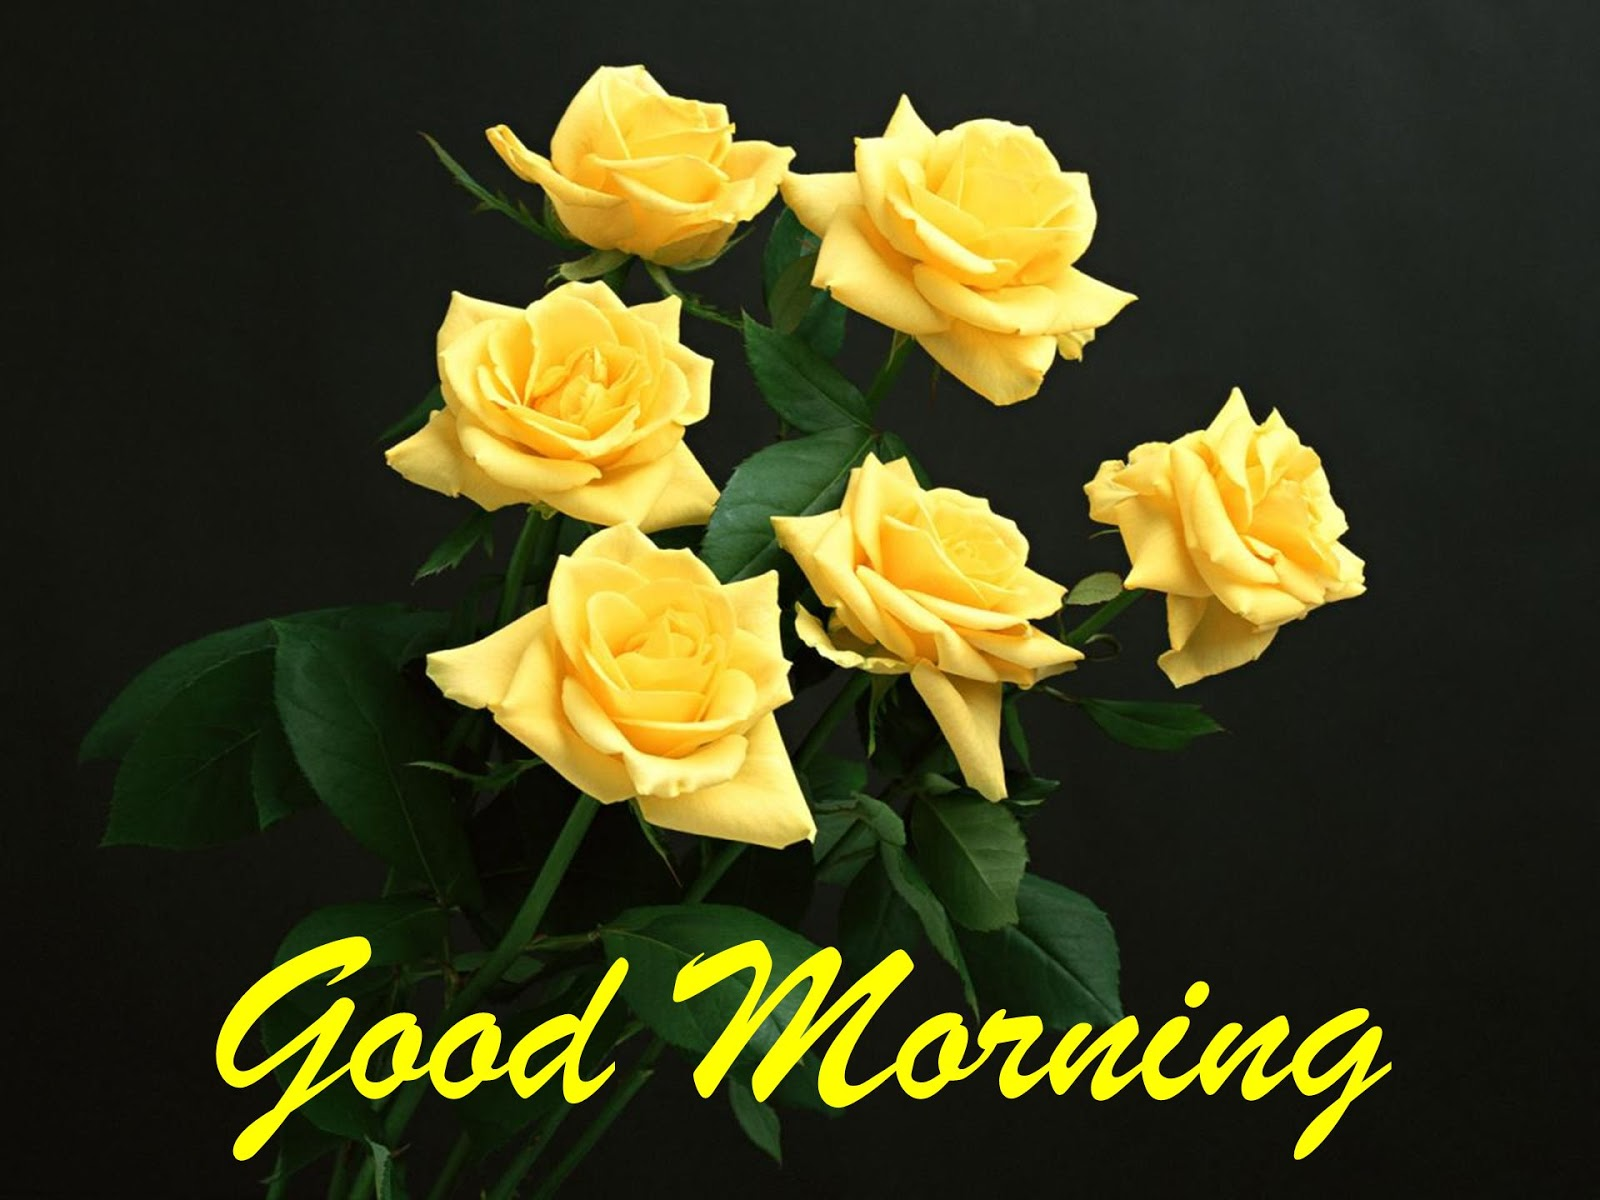 Good Morning Yellow Flowers